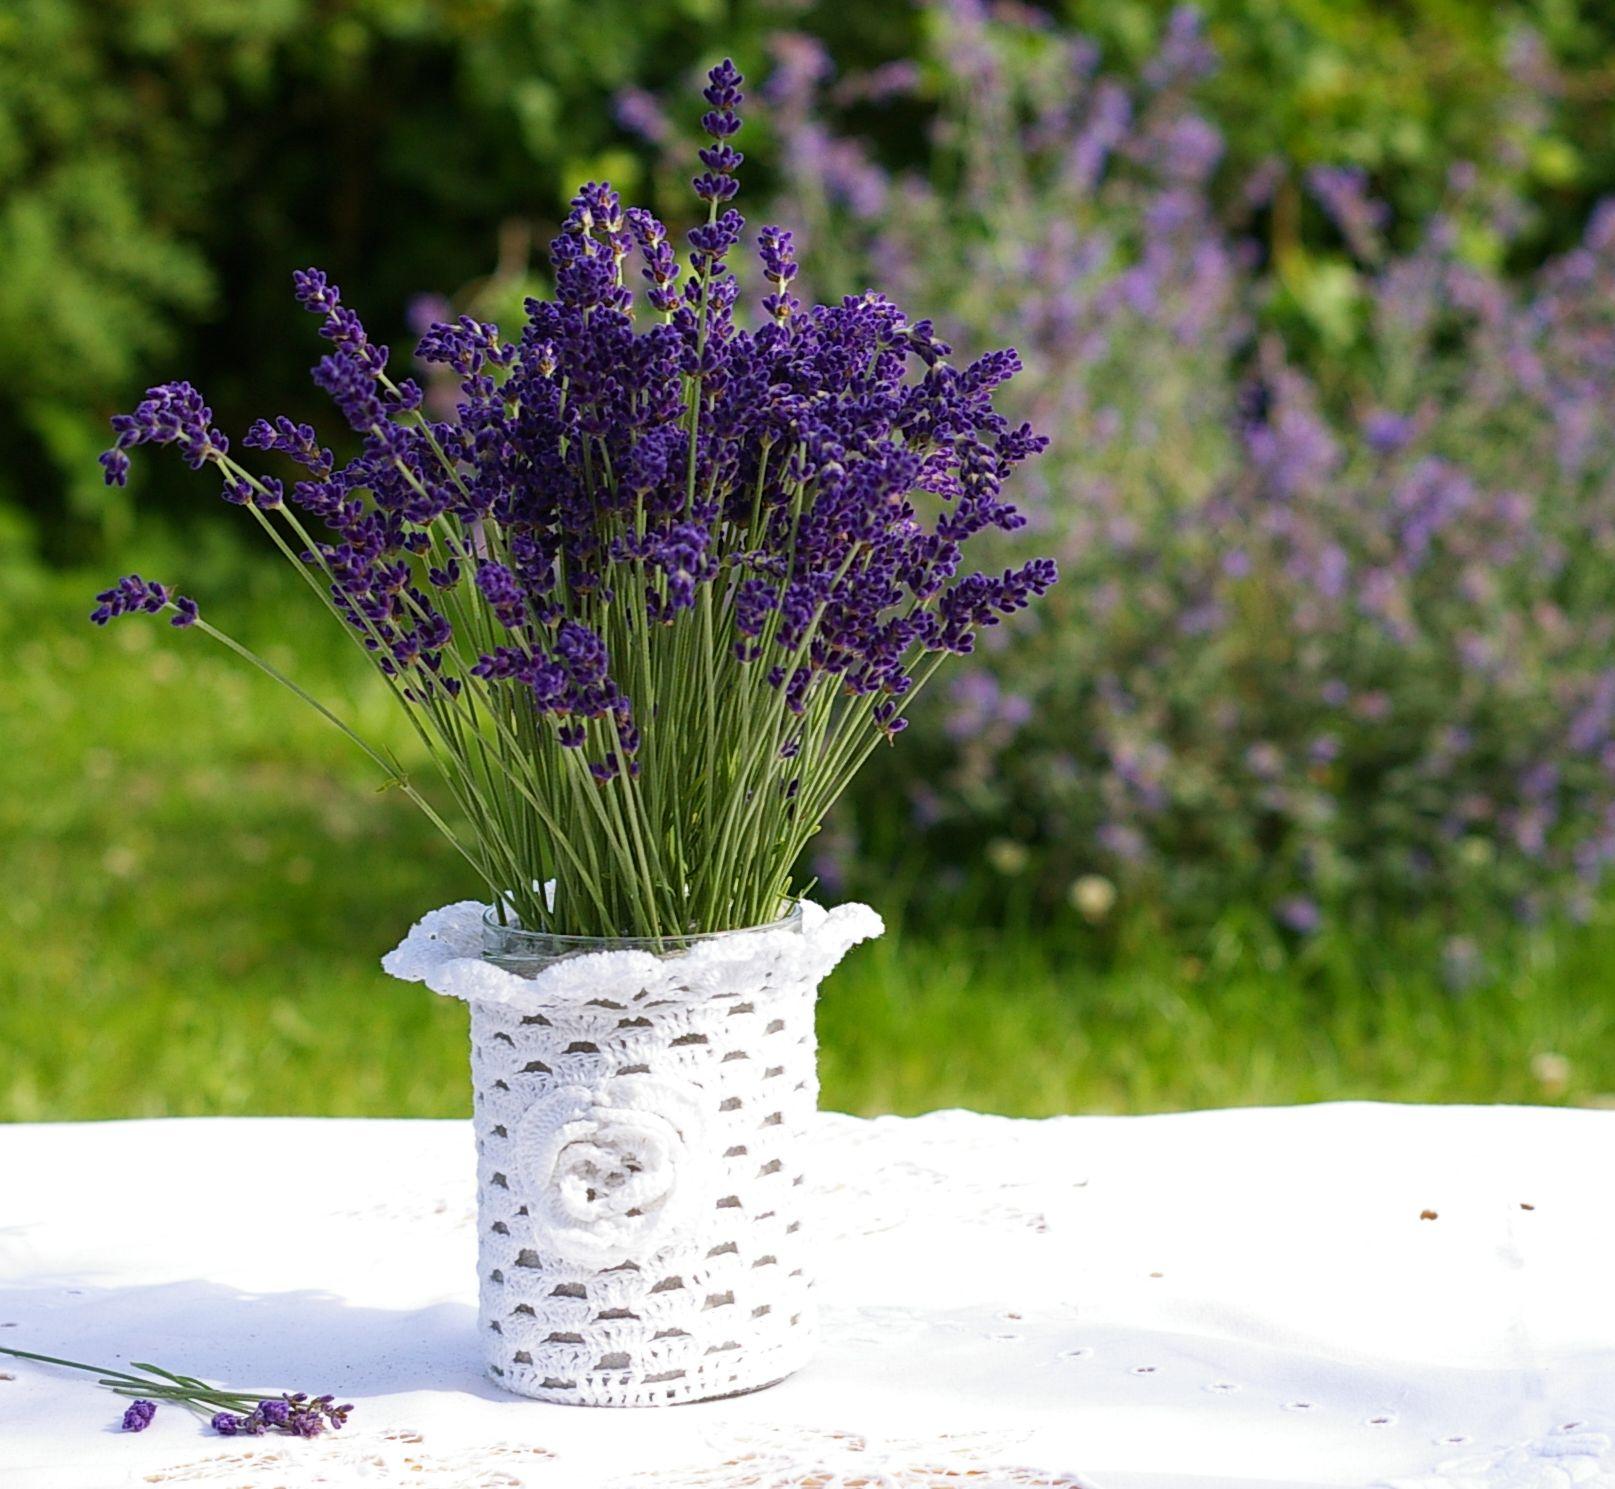 Dko mit Lavendel